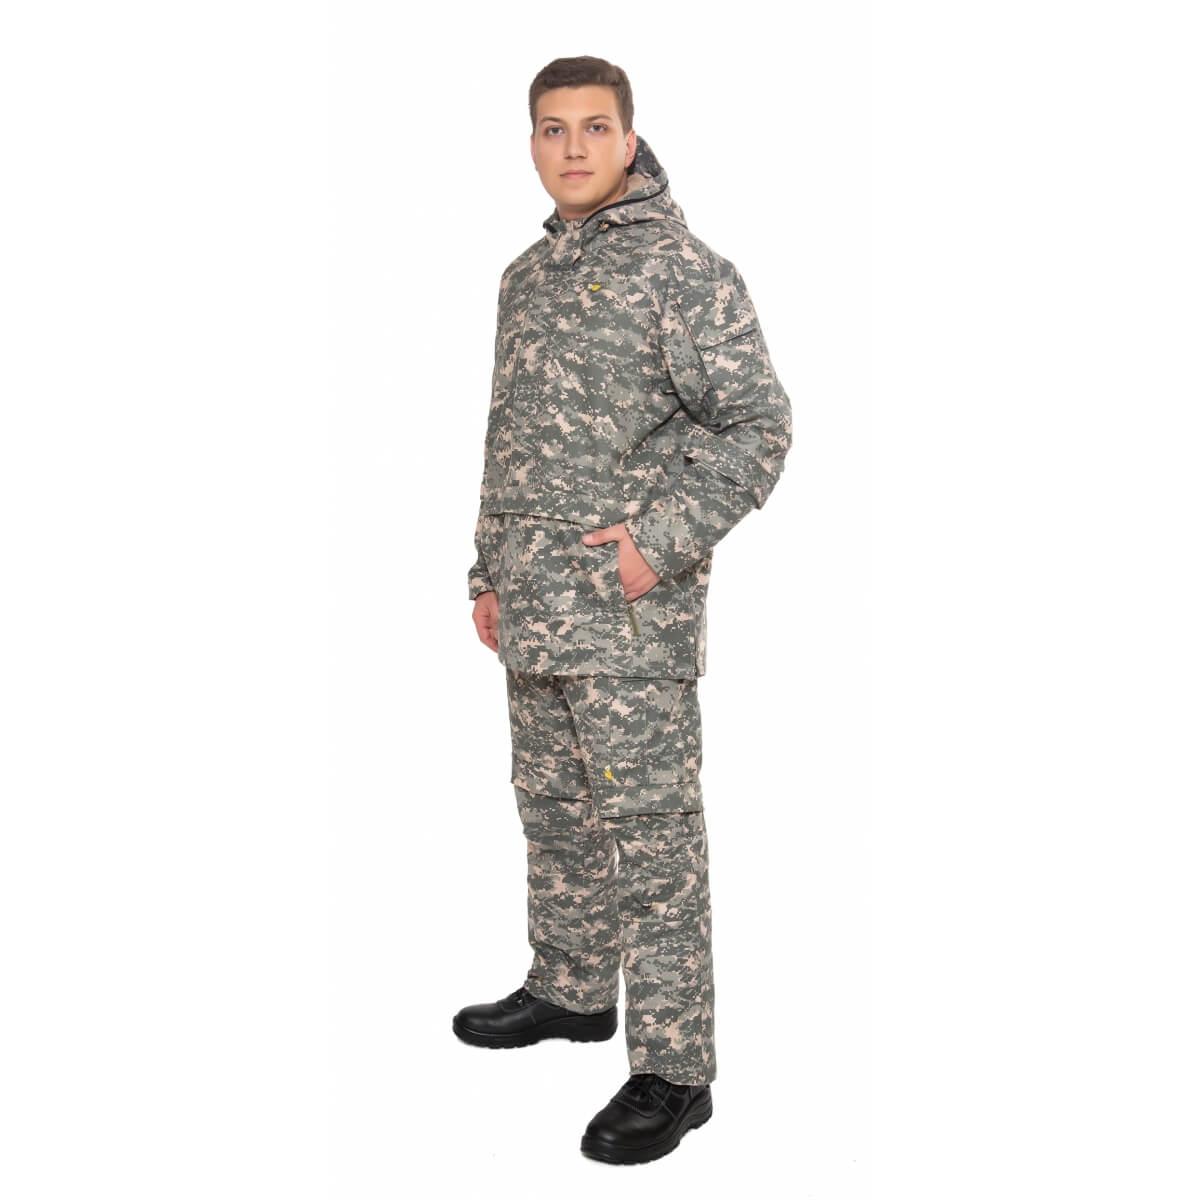 Мужской противоэнцефалитный костюм Биостоп® Оптимум